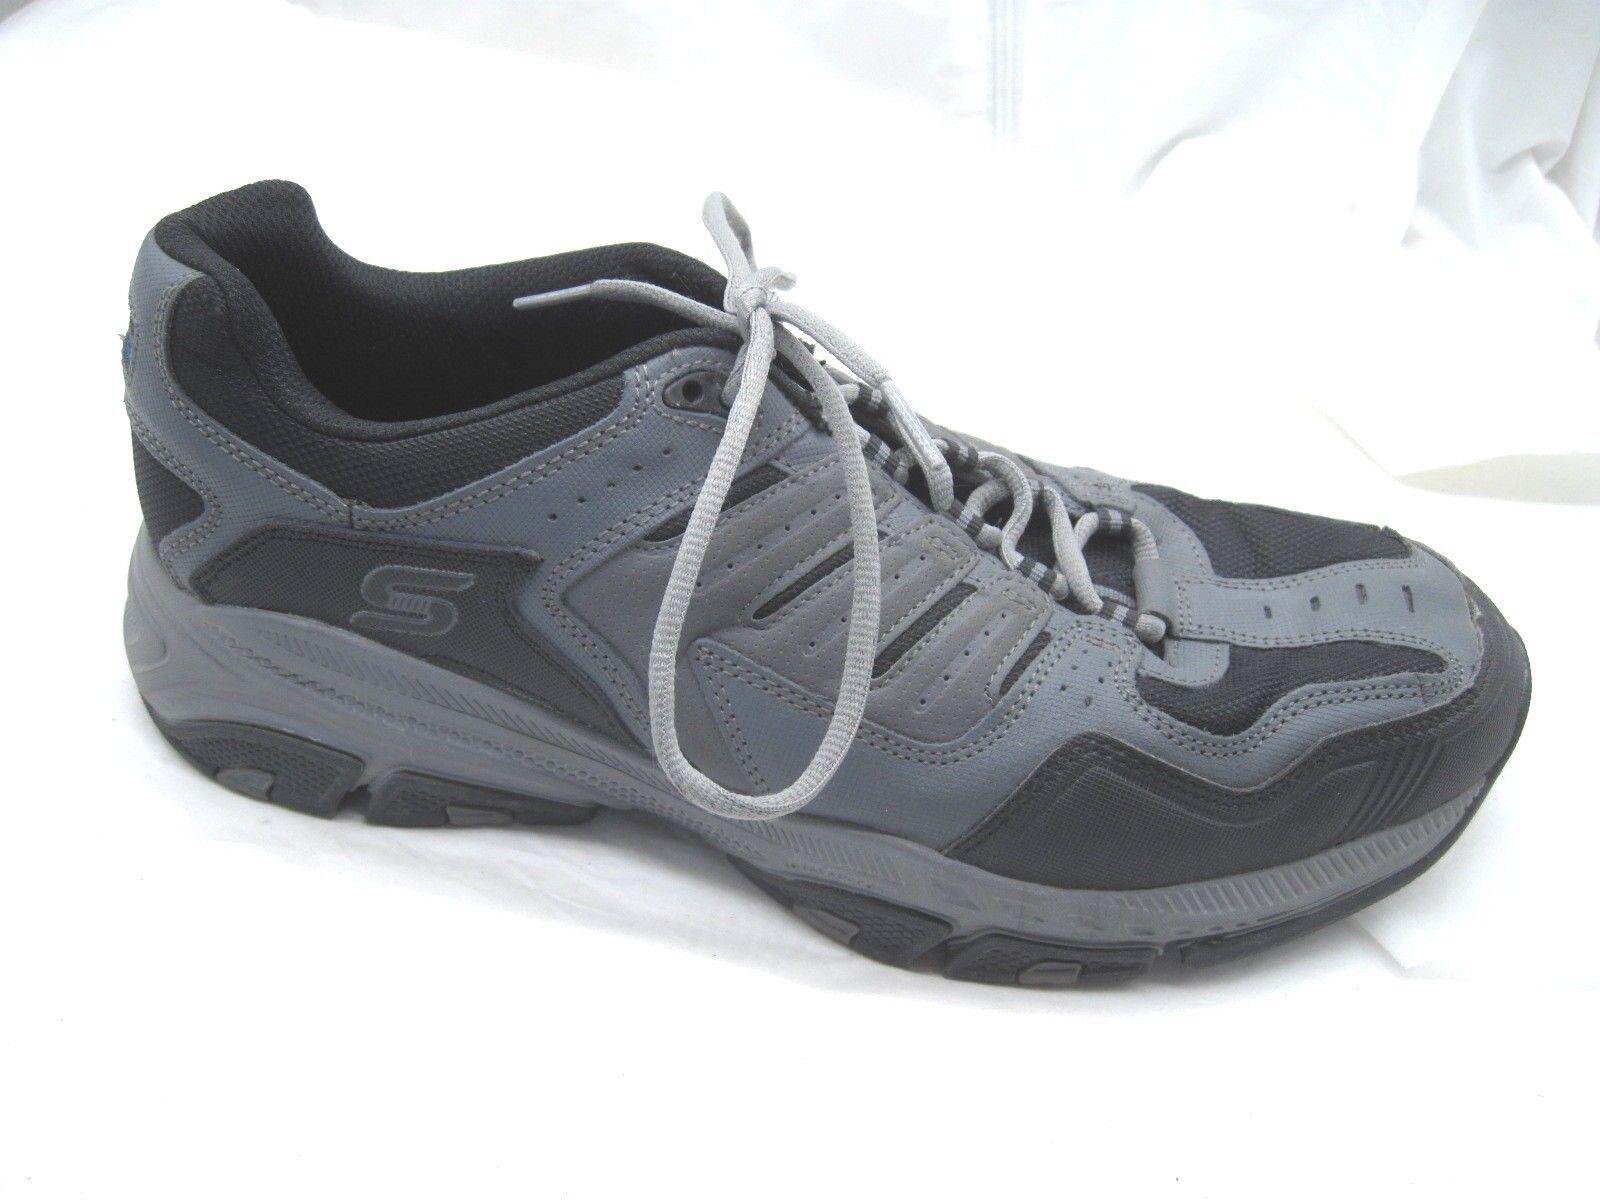 Skechers Cross Court TR charcoal black training mens tennis shoes sz 13M 51270